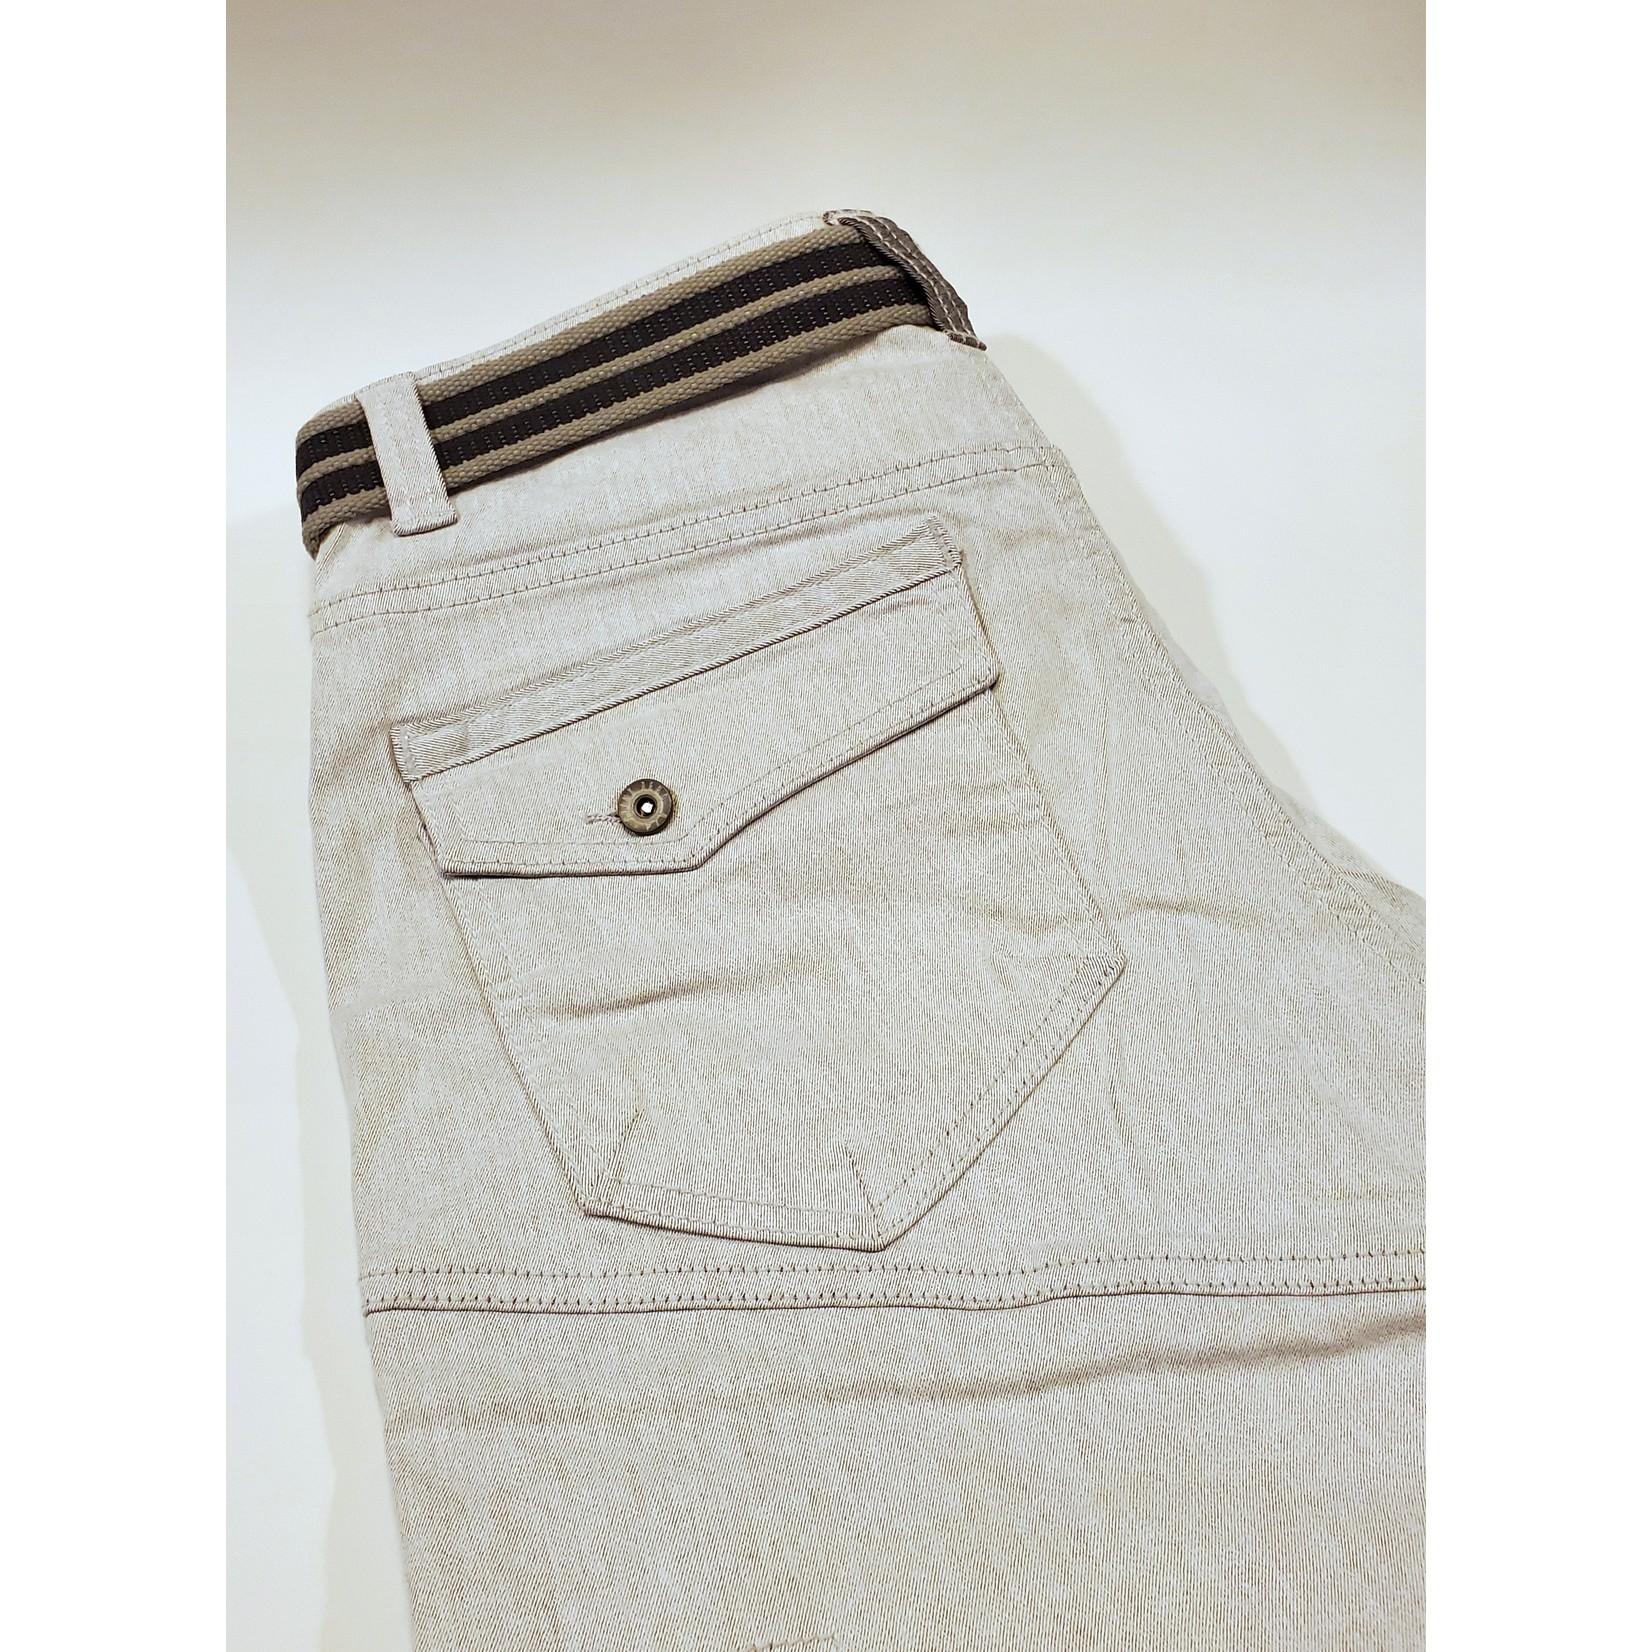 Point Zero 7455475 Two-Tone Long Denim Shorts with Belt